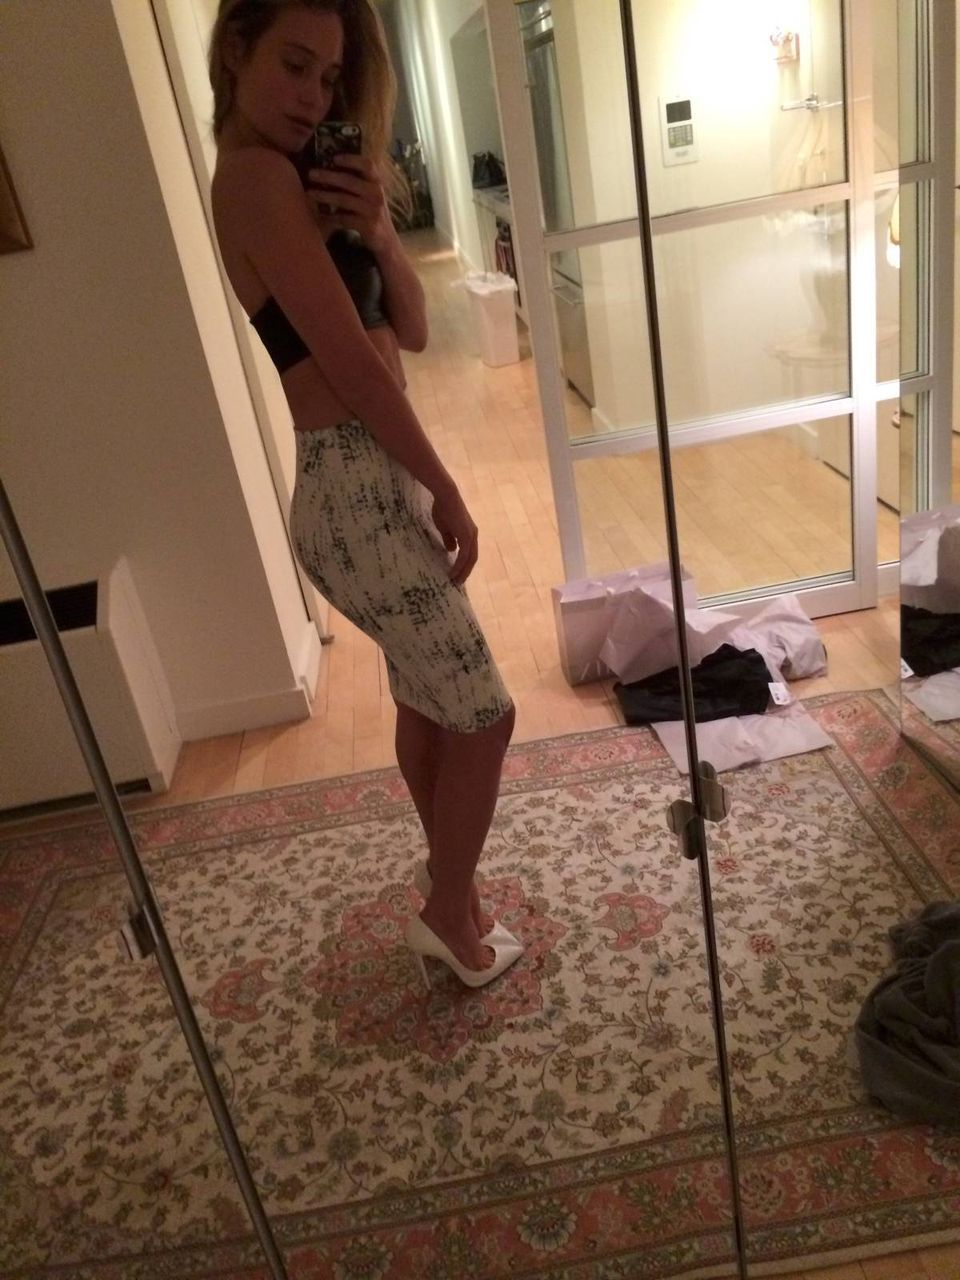 Hannah davis leaked new images